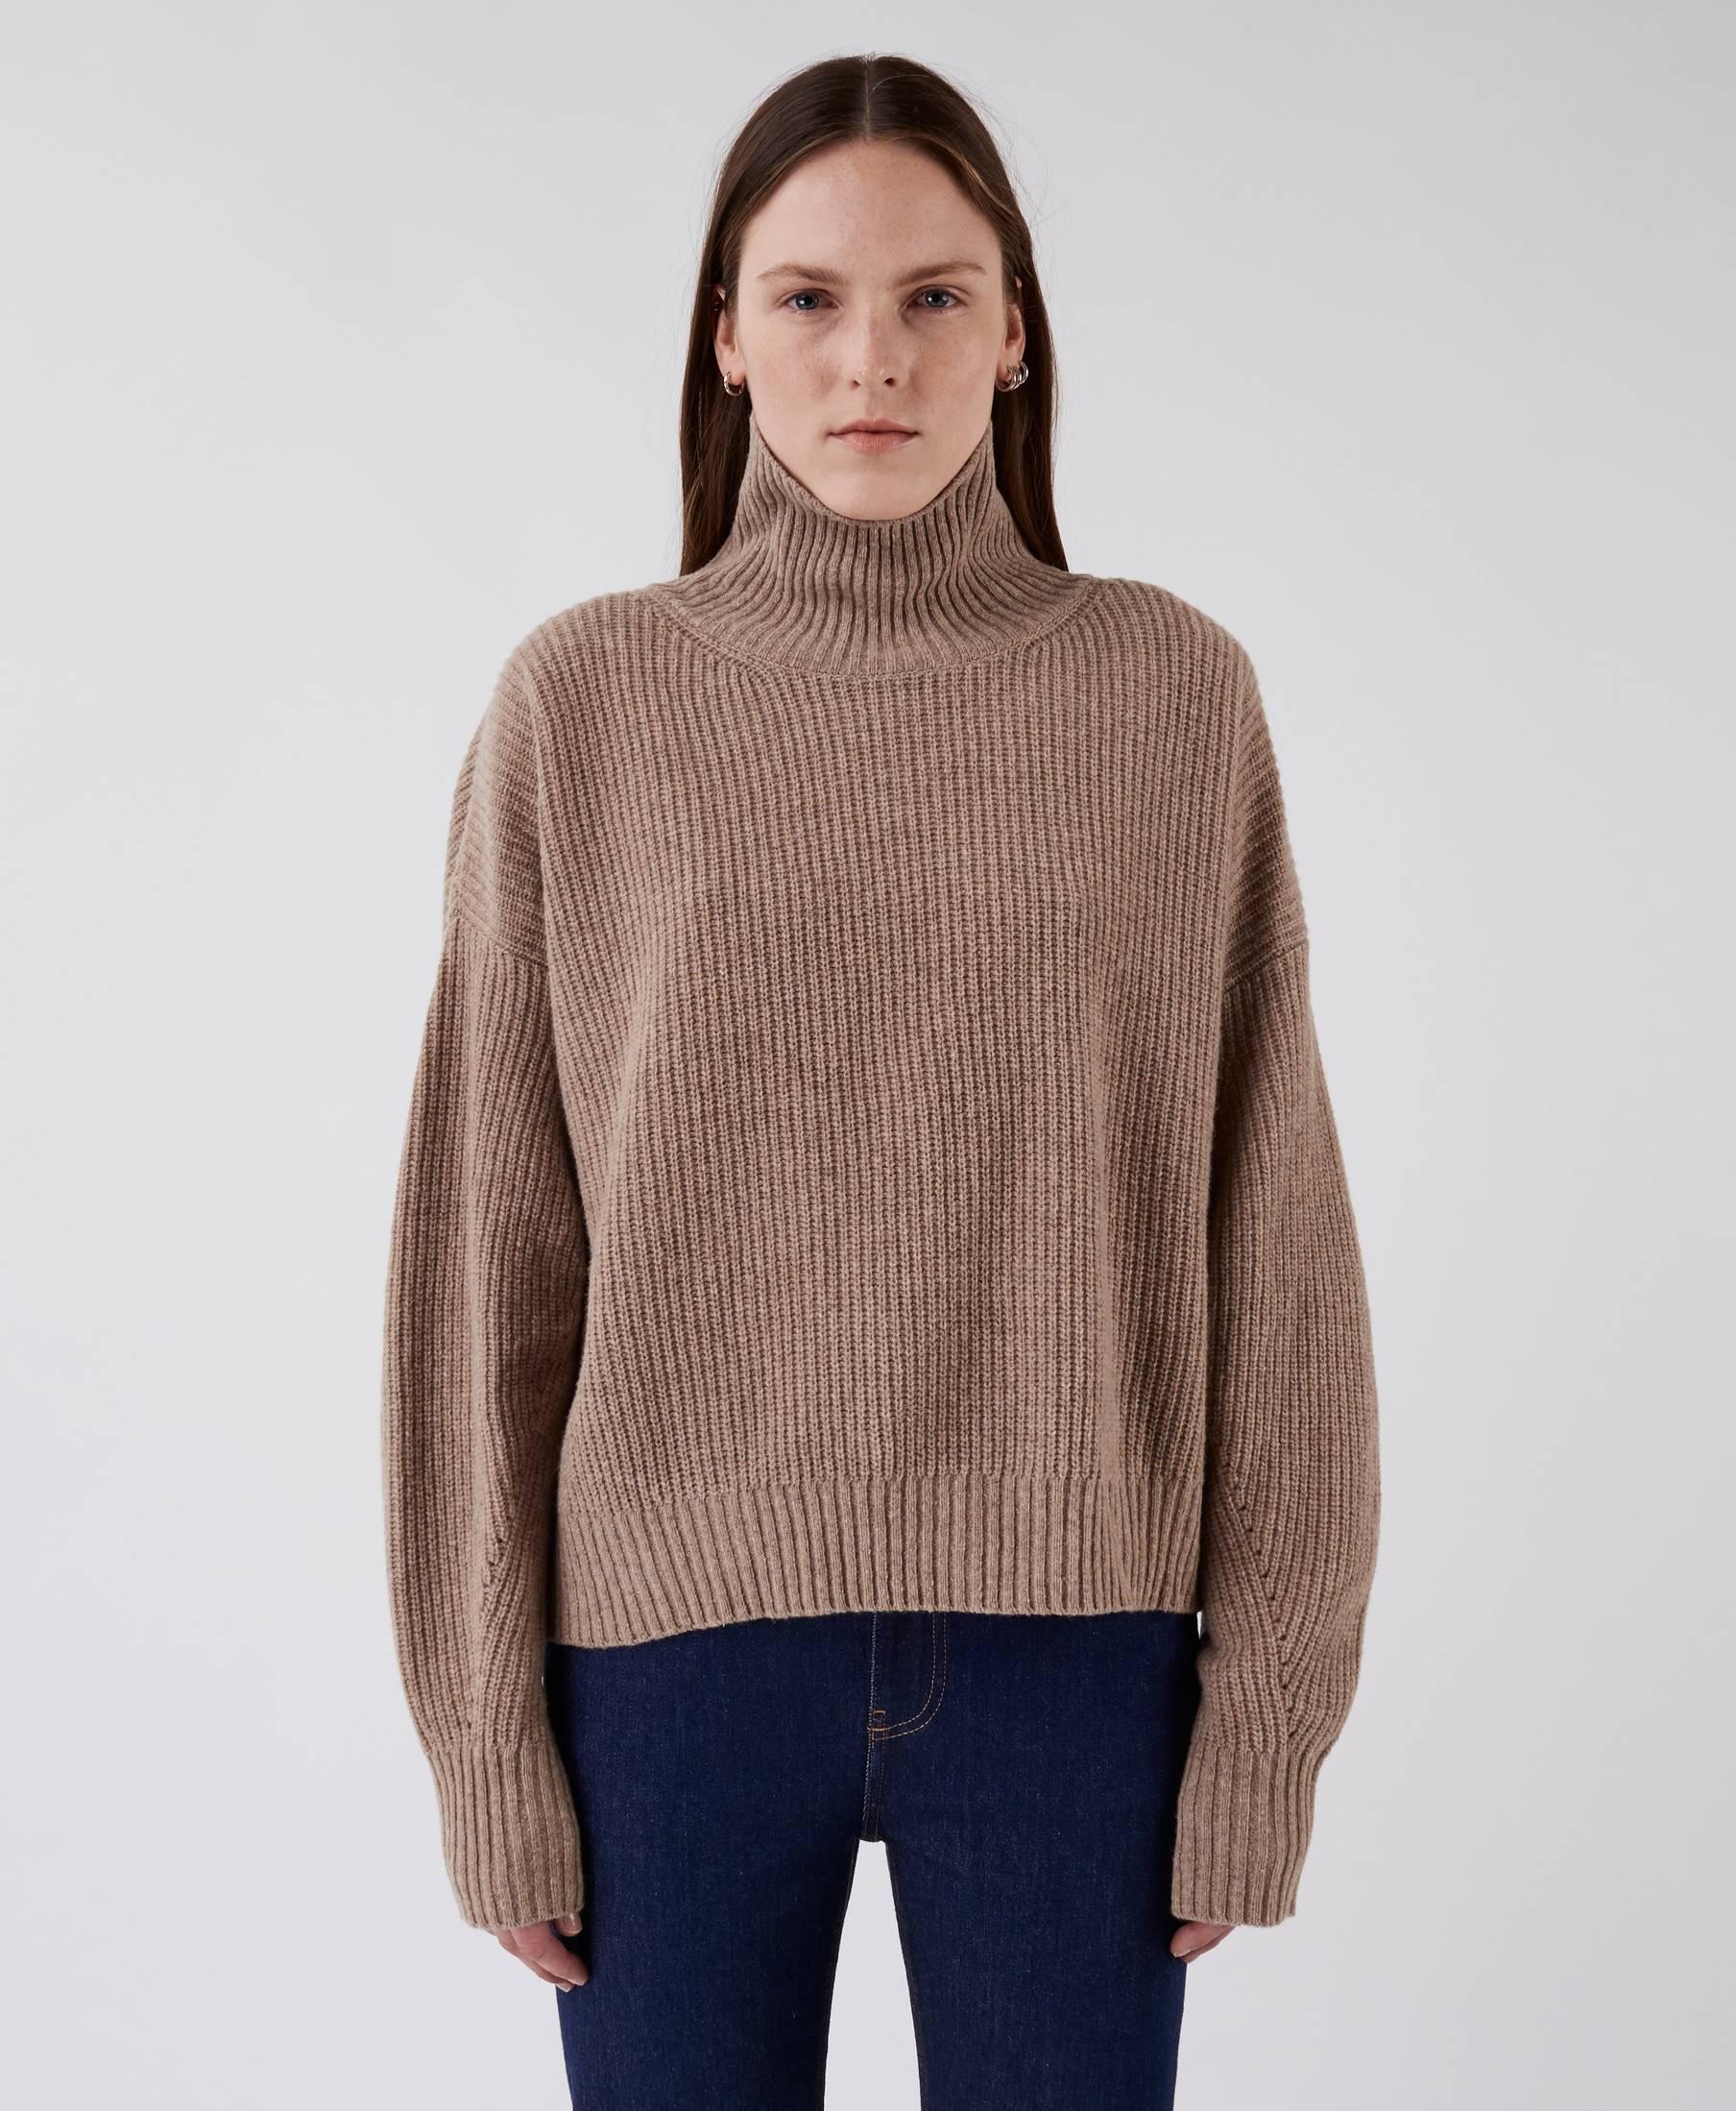 Kara Turtle Sweater Grey Sand